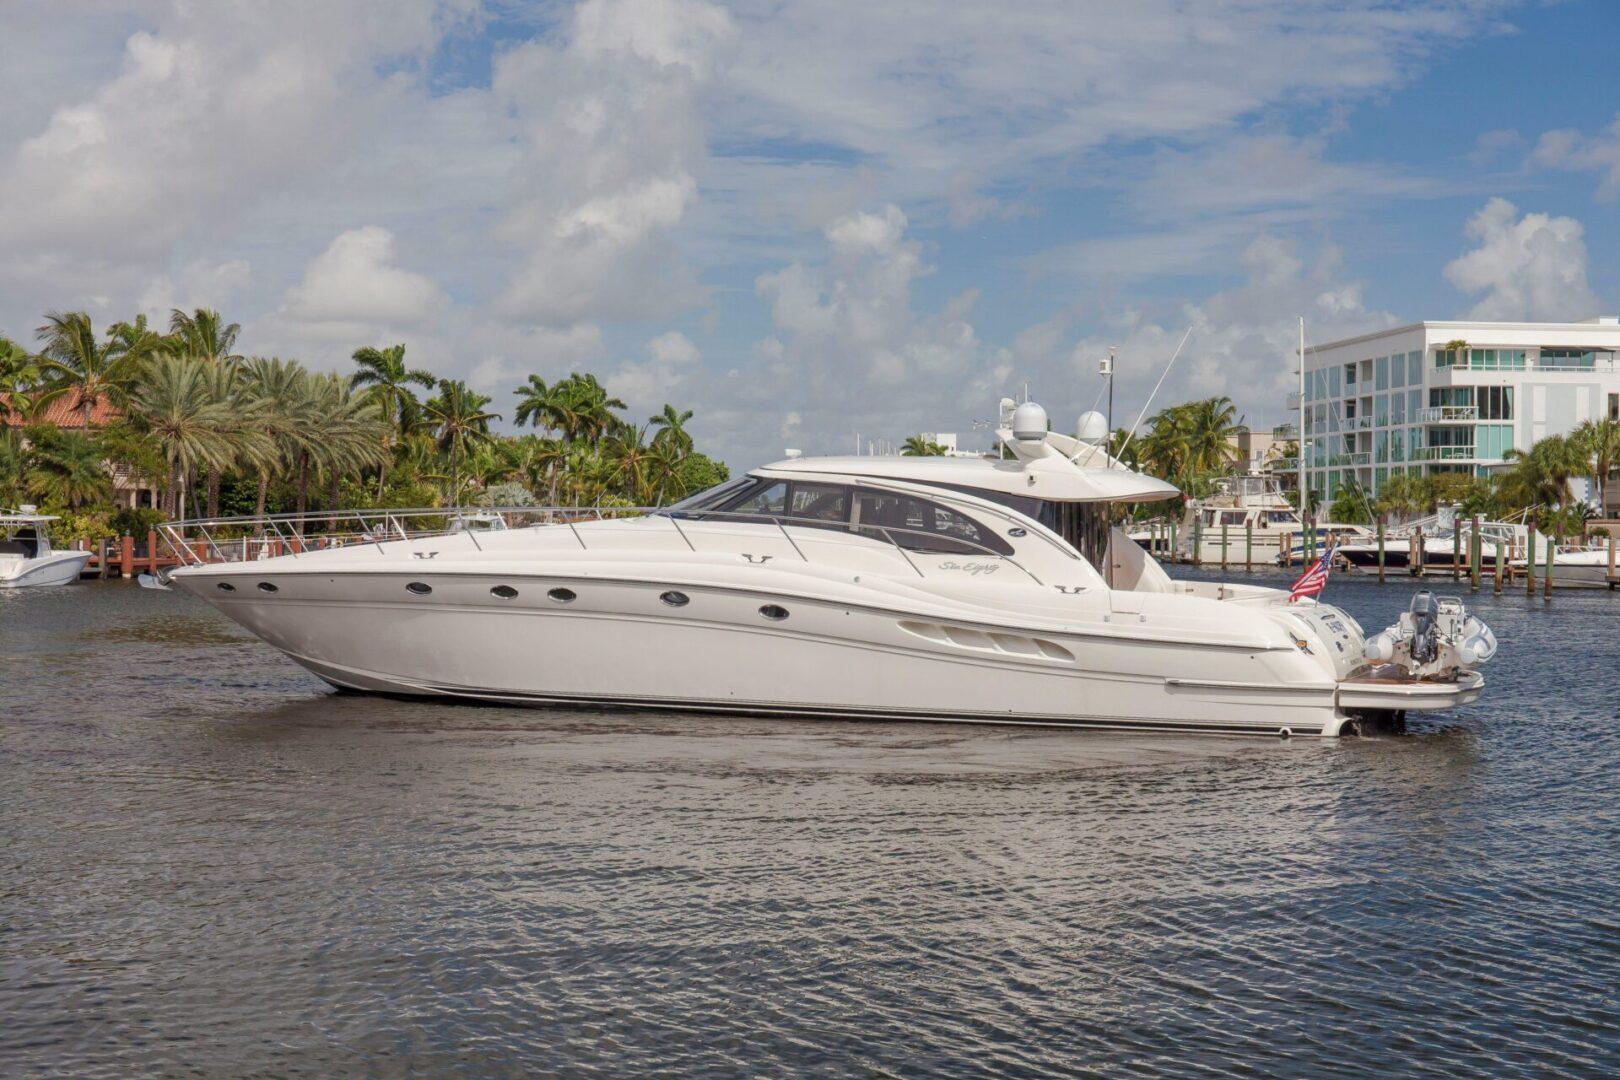 An Enuff yacht yacht near the docks